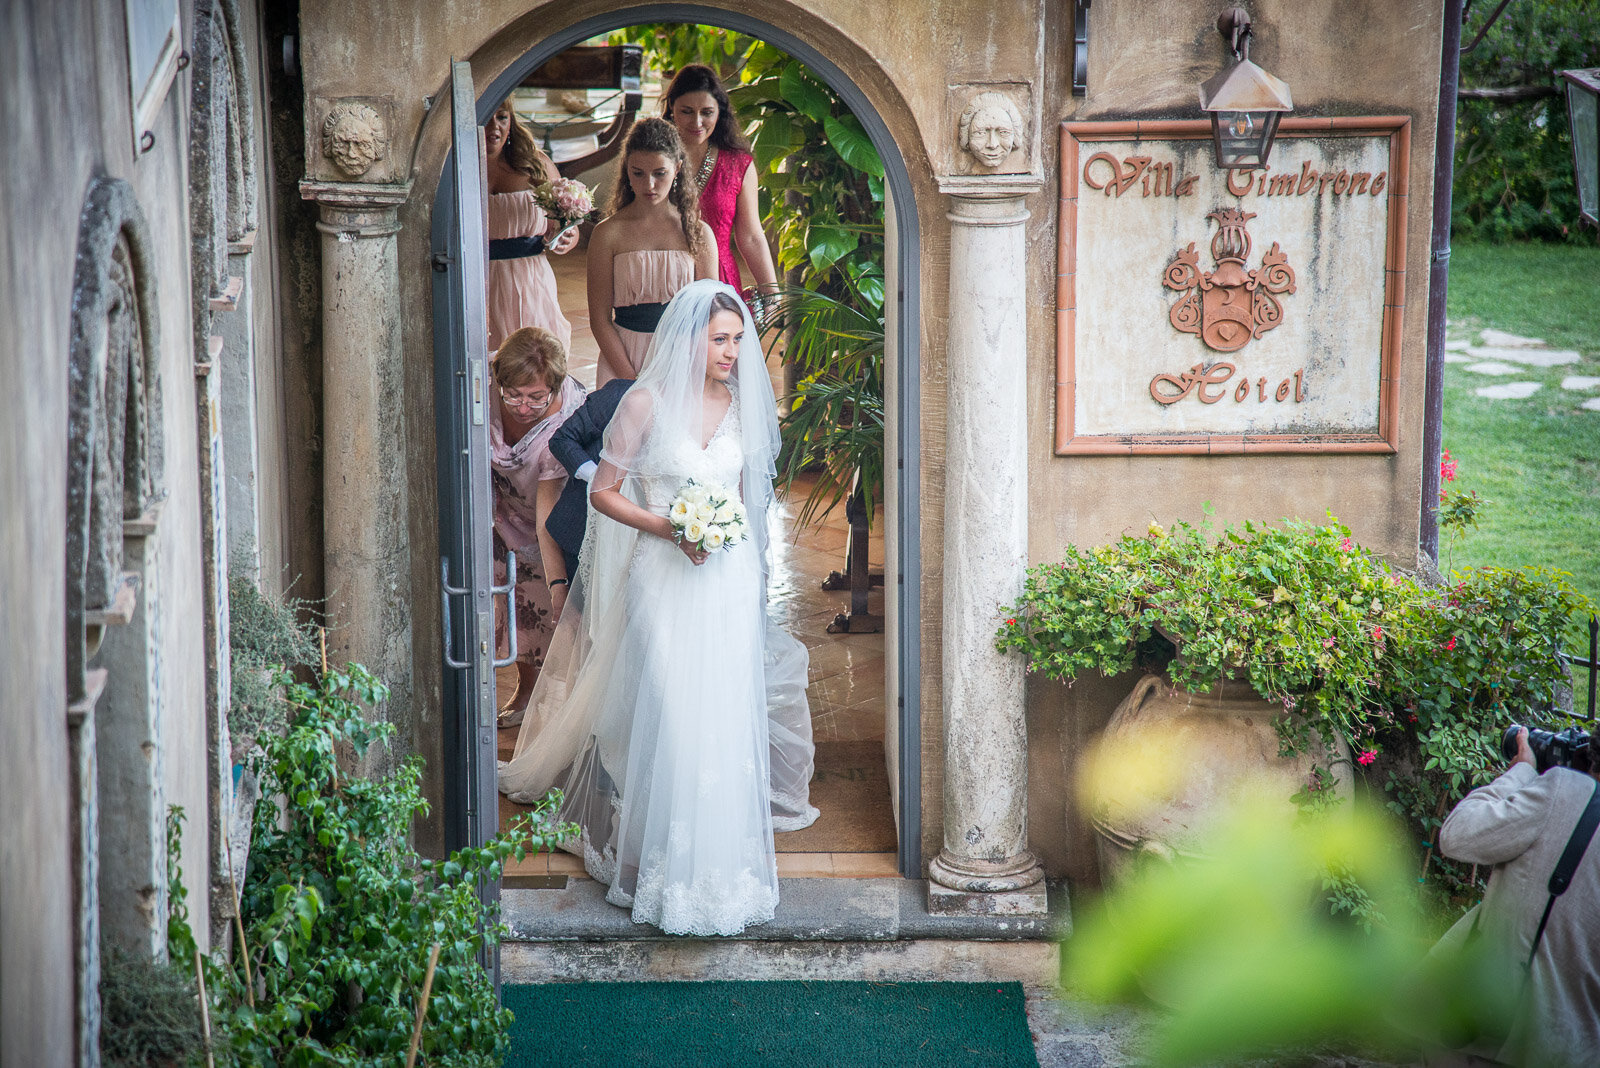 Russian Wedding in Villa Cimbrone Costiera Amalfitana 01-2.jpg